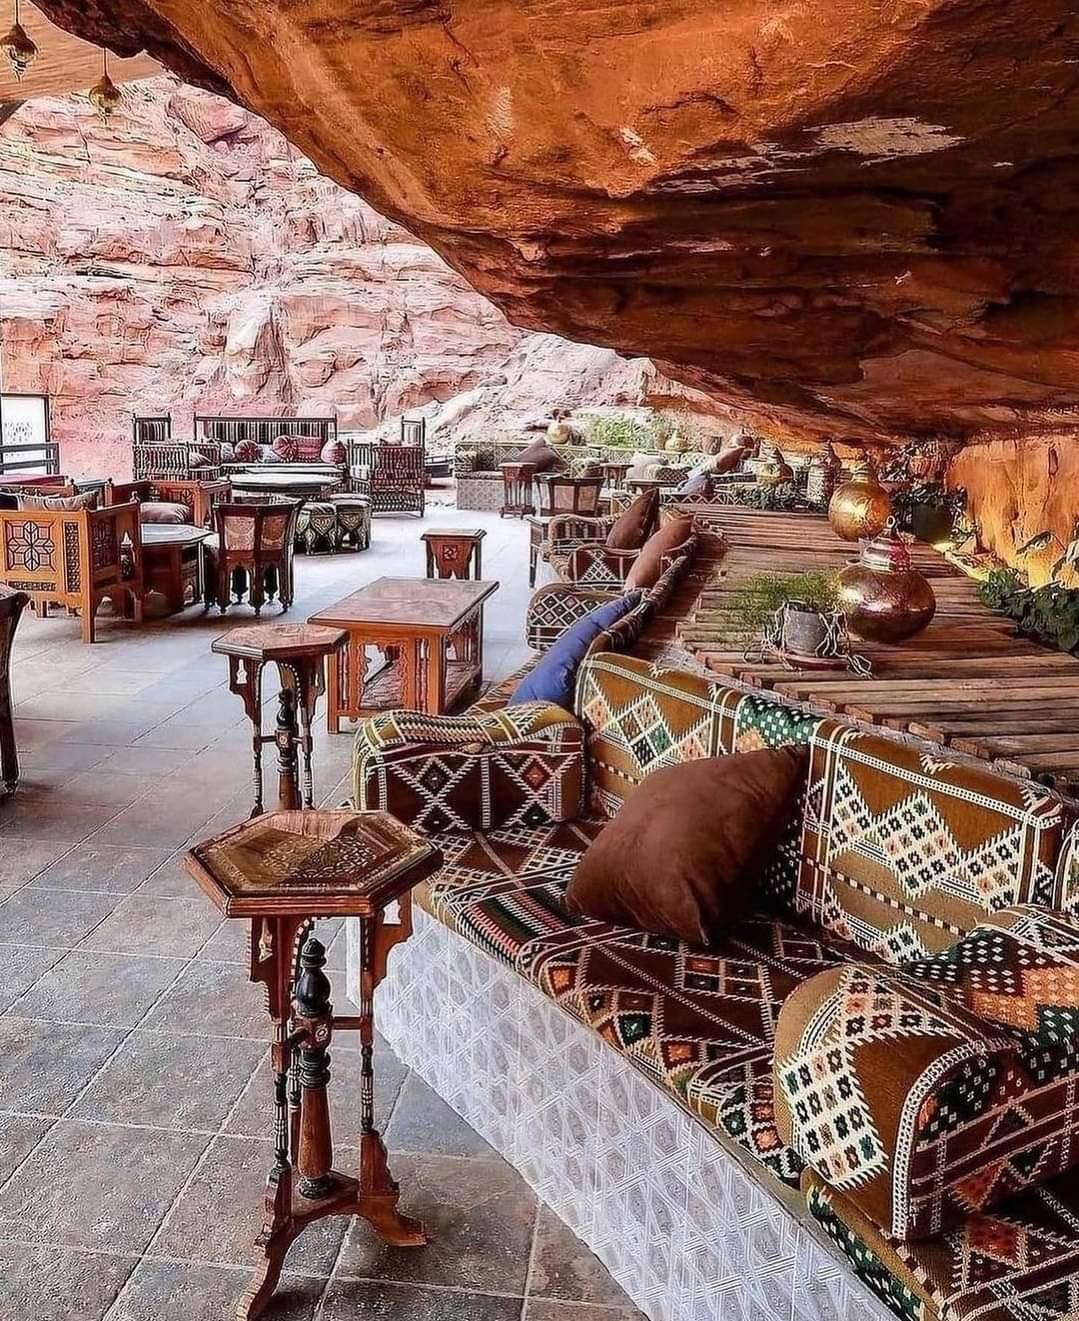 Aicha Luxury Camp Wadi Ram Desert, Jordan